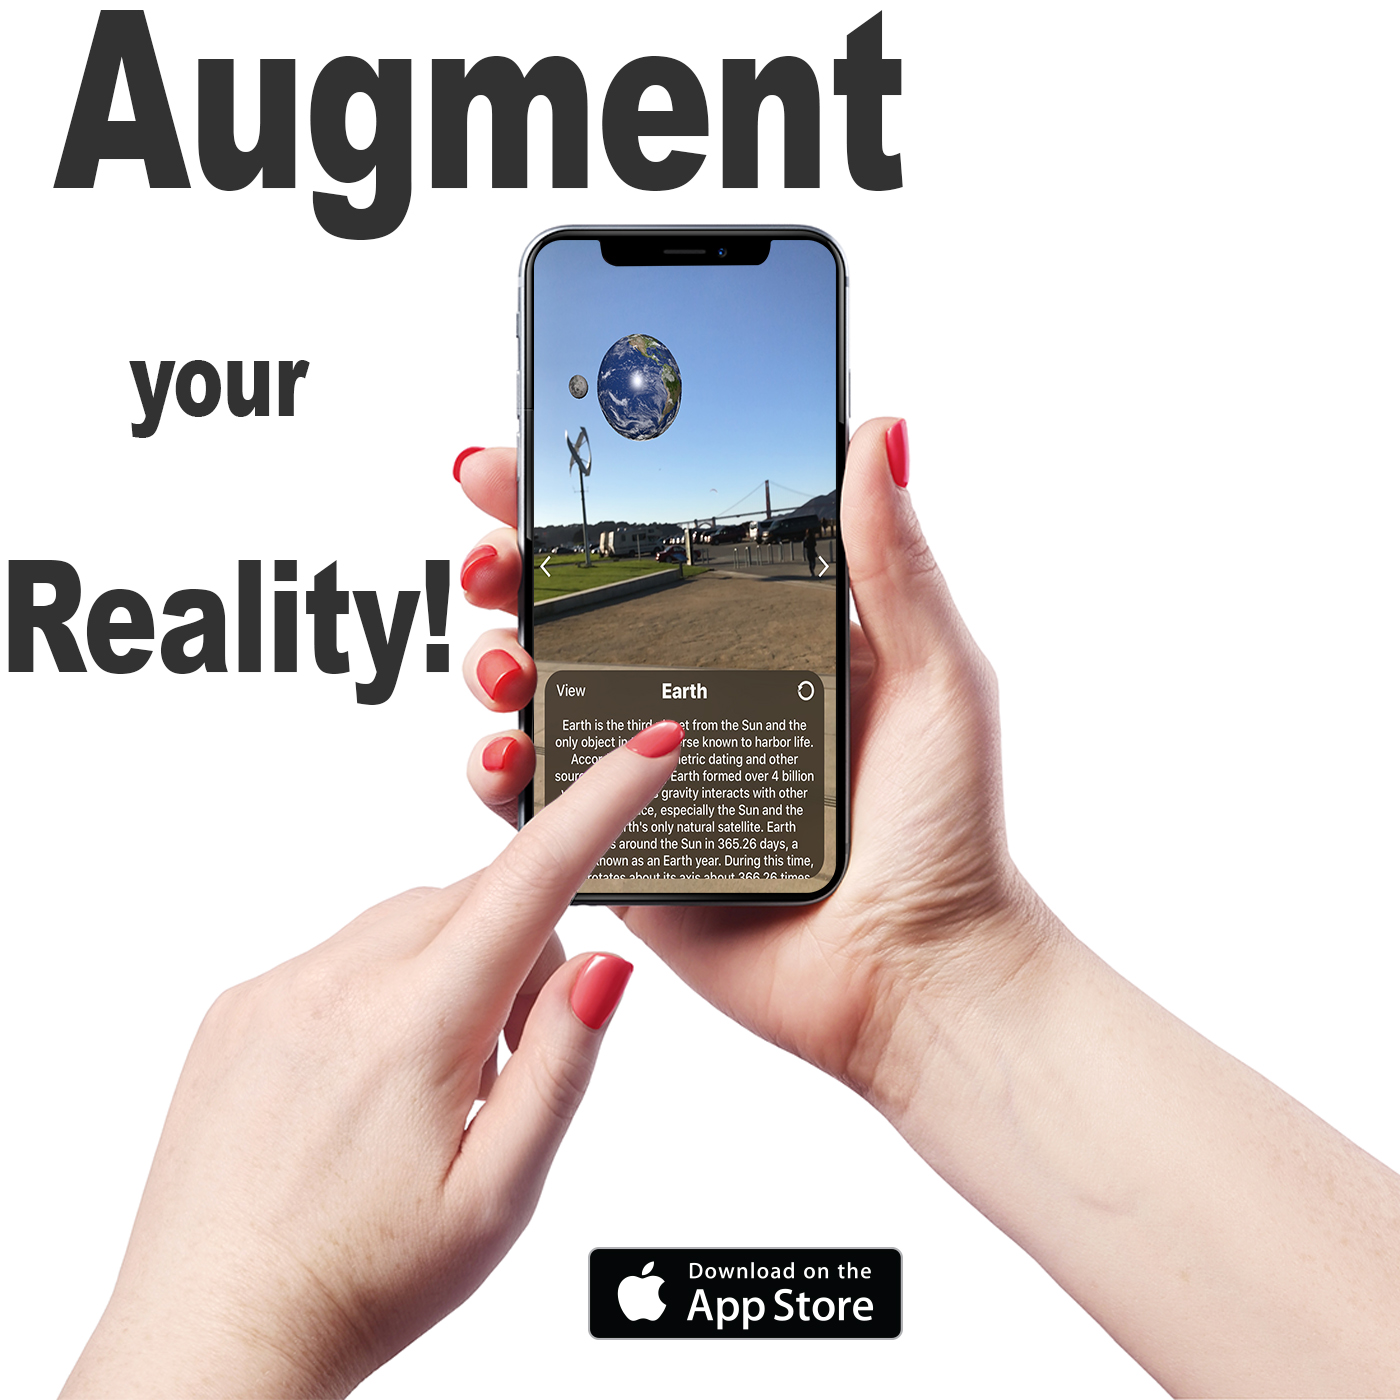 TBSAU iPhone X Ad 2.jpg